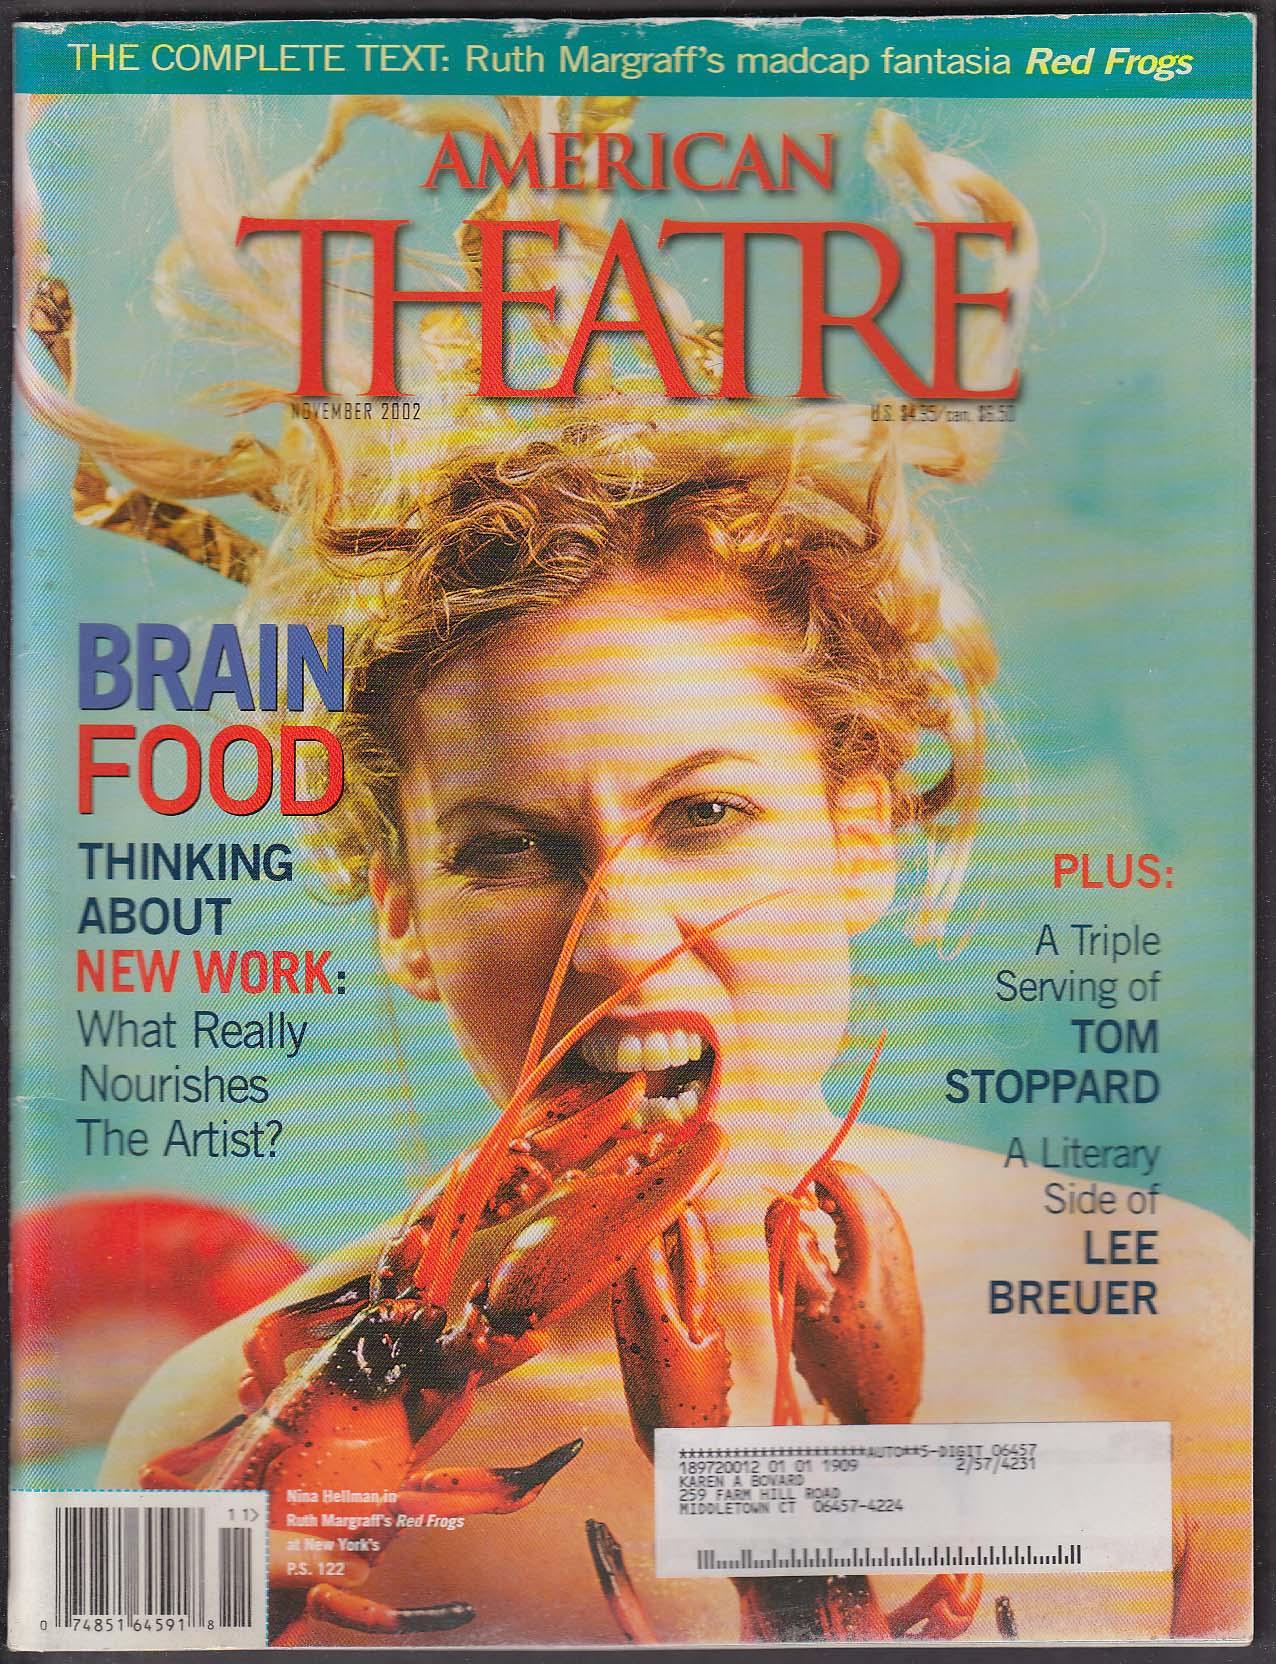 AMERICAN THEATRE Nina Hellman Tom Stoppard Lee Breuer Ruth Margraff ++ 11 2002